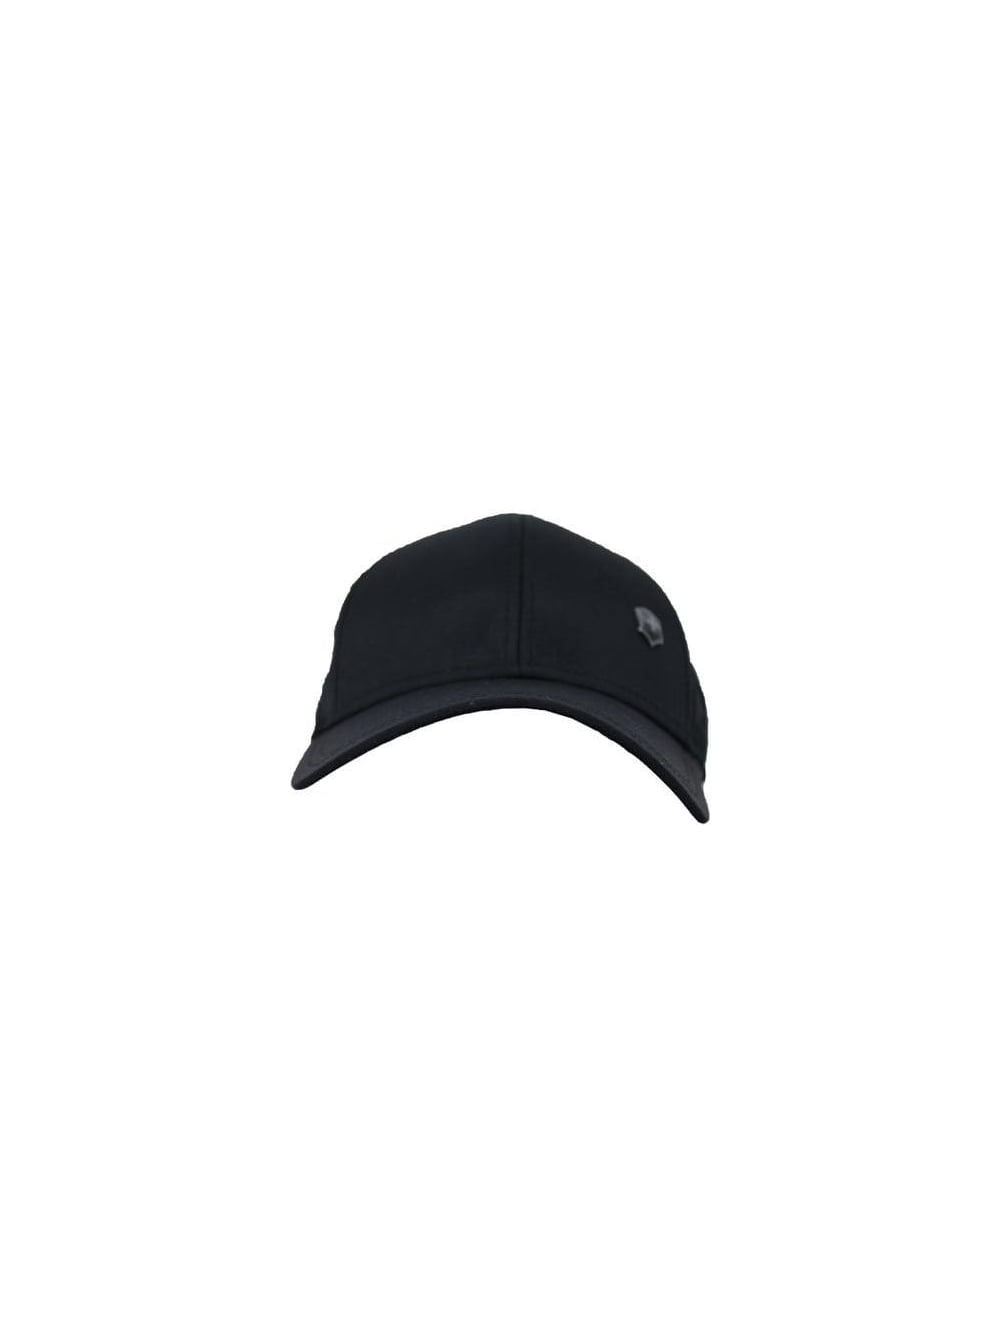 Victorinox Canvas Baseball Cap in Black - Northern Threads 7030282ae36